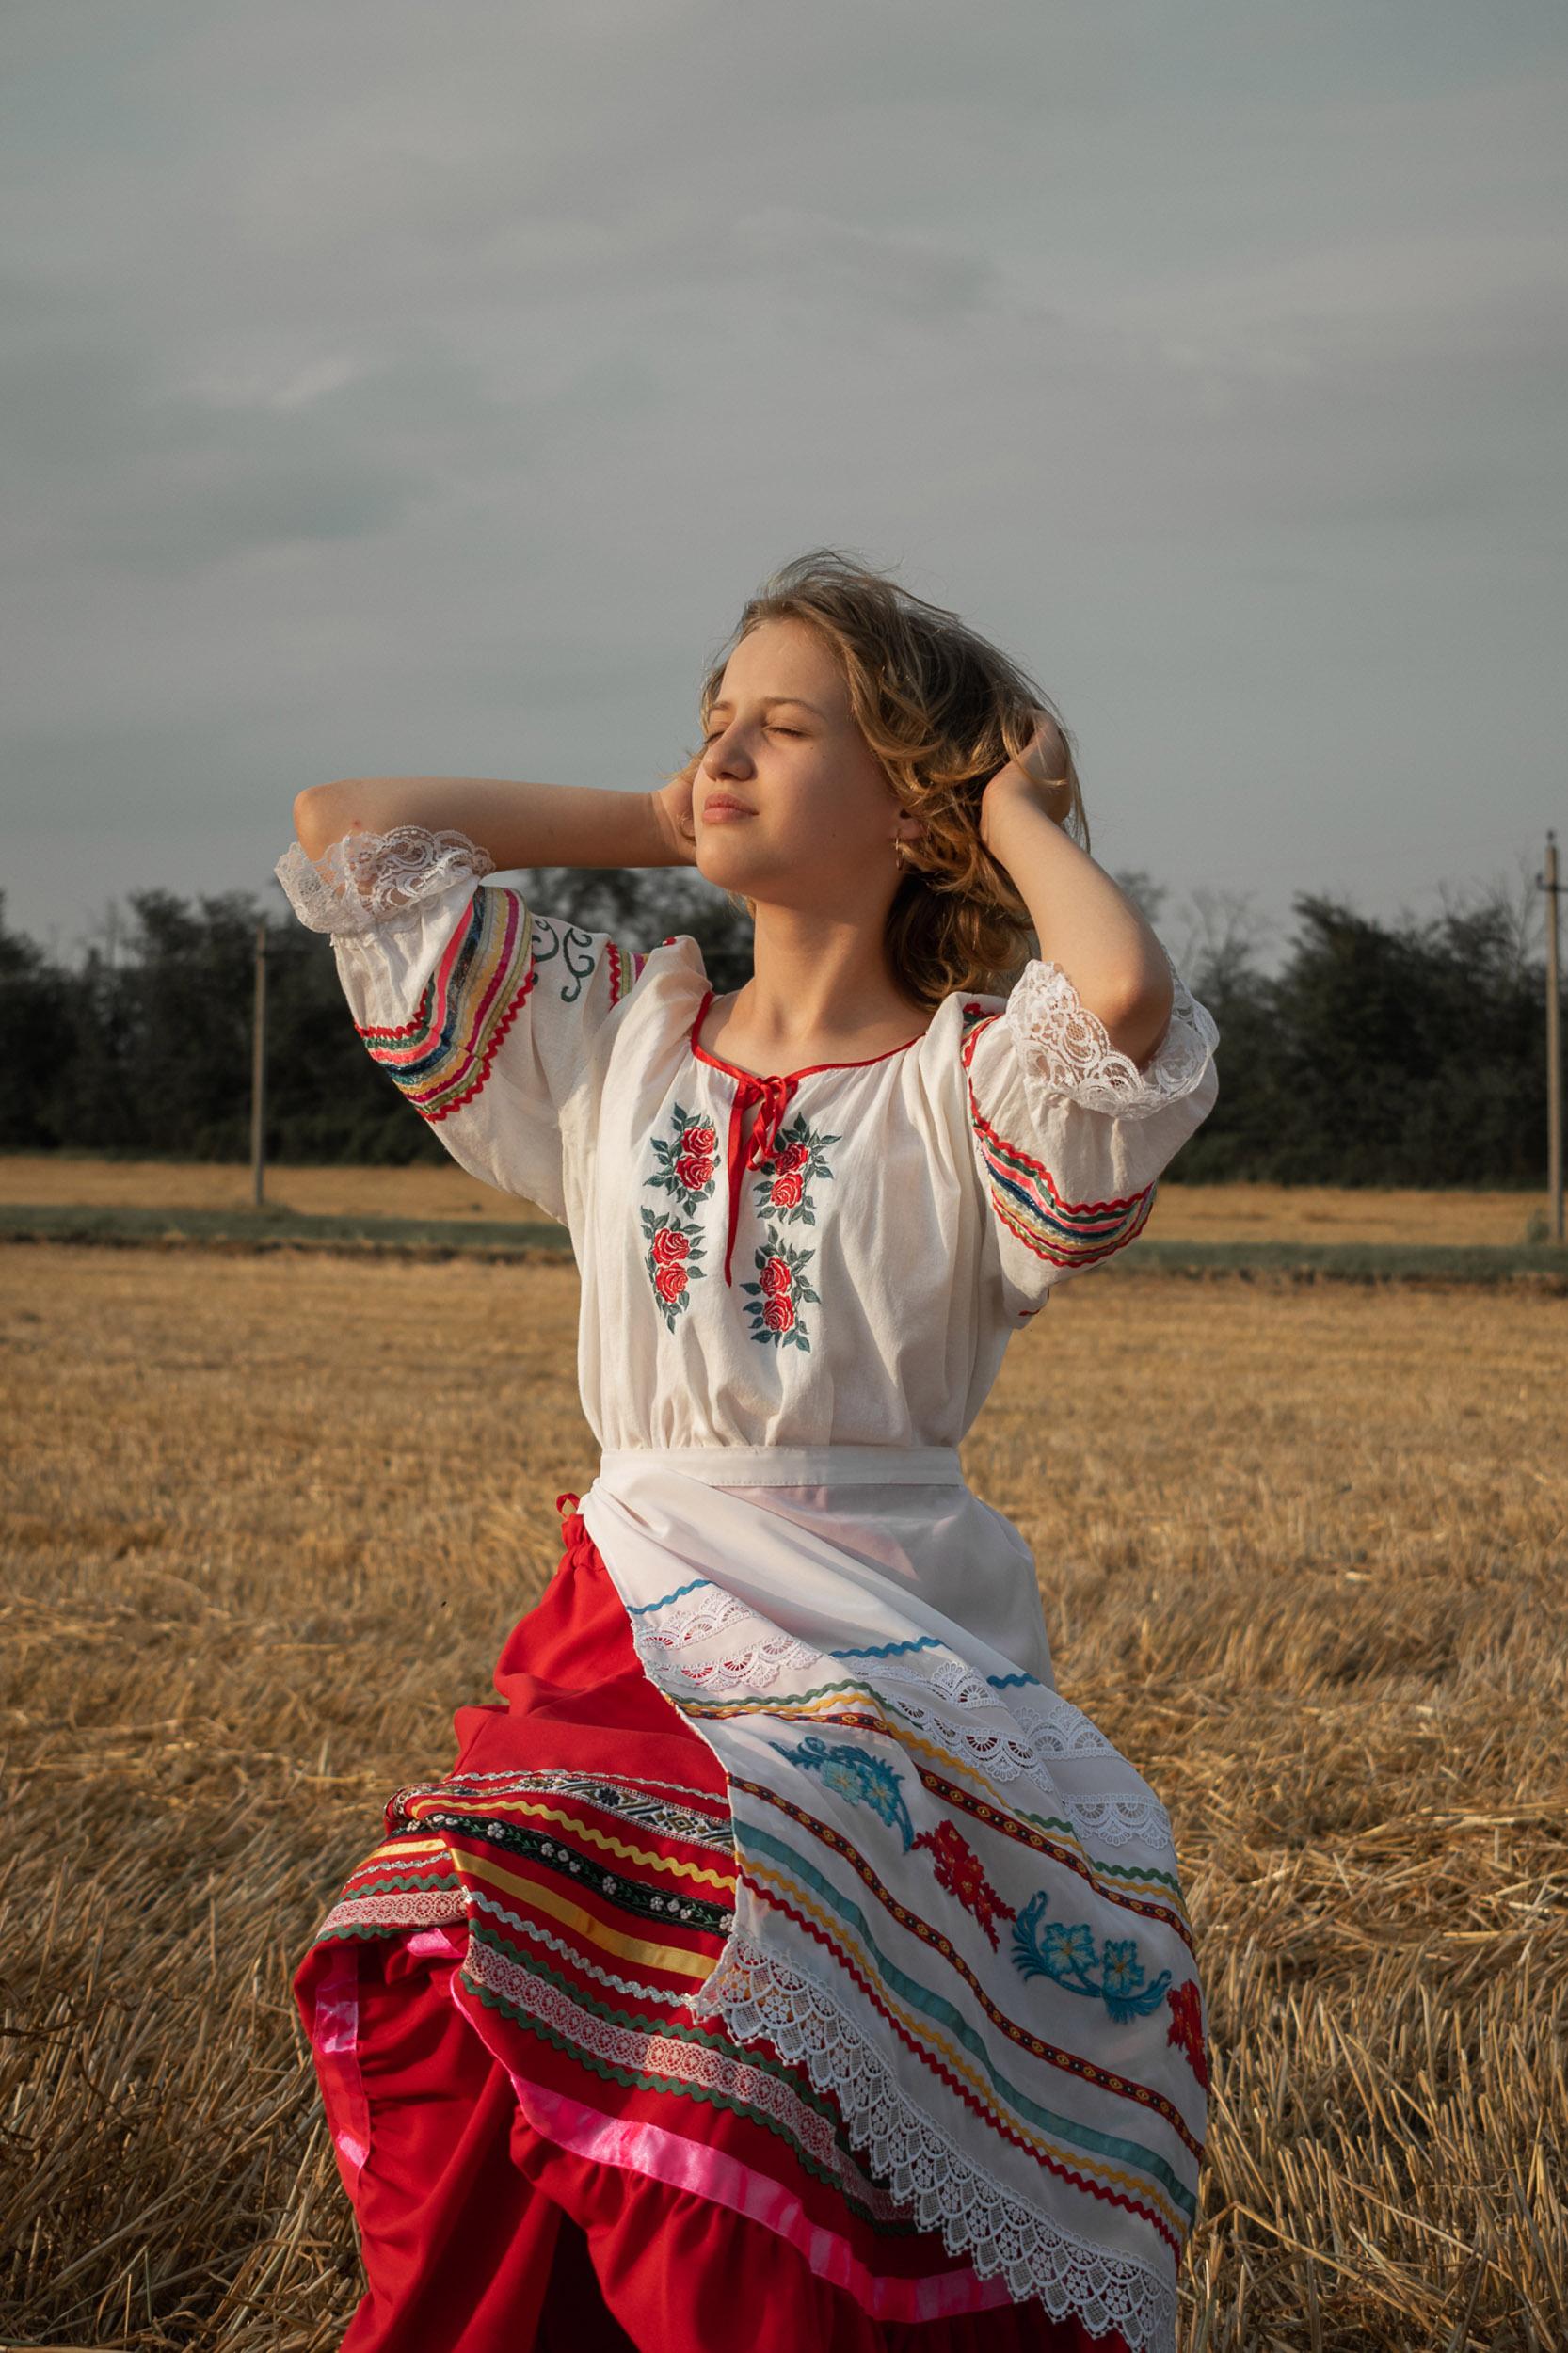 Categorie: Portrait, Glamour - Photographer: Асеева Наталья - Location: Краснодарский край, Russia